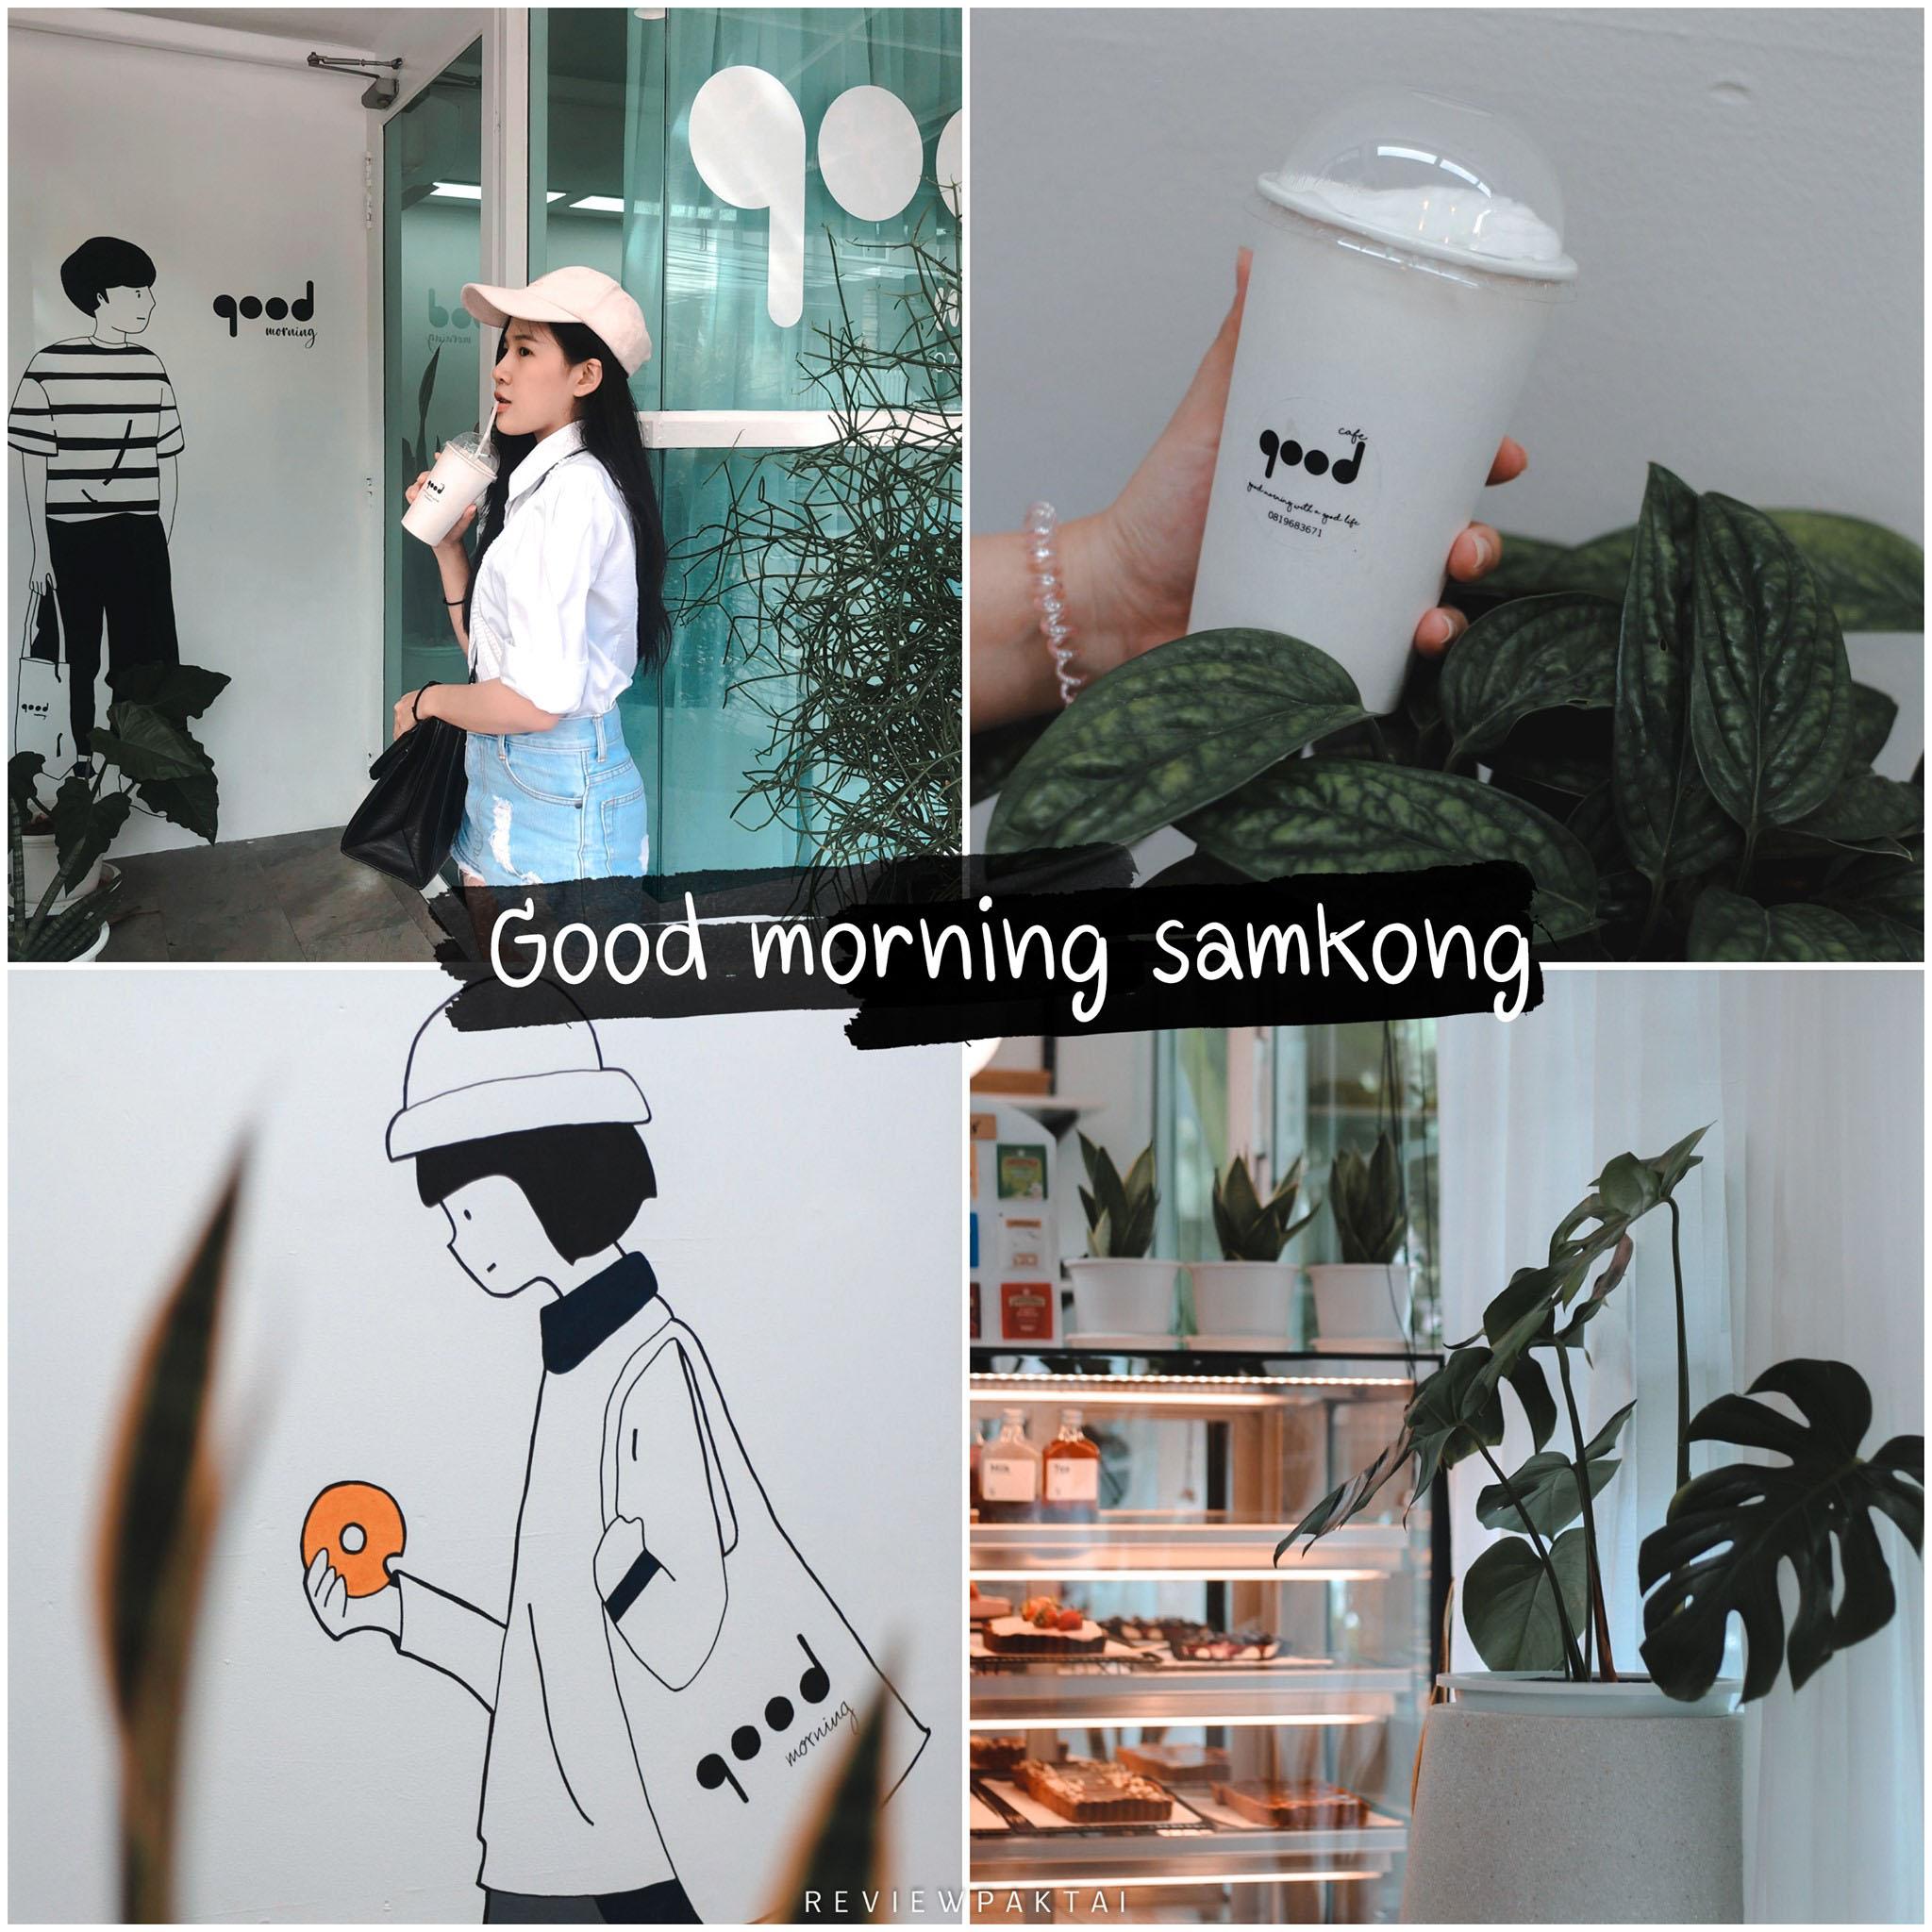 Good-Morning-by-Good-Cafe ร้านตกแต่งโทนสีขาวดำ-ดูสะอาดสบายตา-มีต้นไม้ฟอกอากาศอีกด้วยร้านเป็นสไตล์-minimal-เมนูแนะนำก็-Yakult-Pipo-Tart,-Choco-Banana-Tart,-Raspberry-Tart-แล้วก็เค้กต่างๆก็อร่อยเลยแหละ-ไม่ผิดหวังแน่นอน ภูเก็ต,คาเฟ่,ที่เที่ยว,ร้านกาแฟ,เด็ด,อร่อย,ต้องลอง